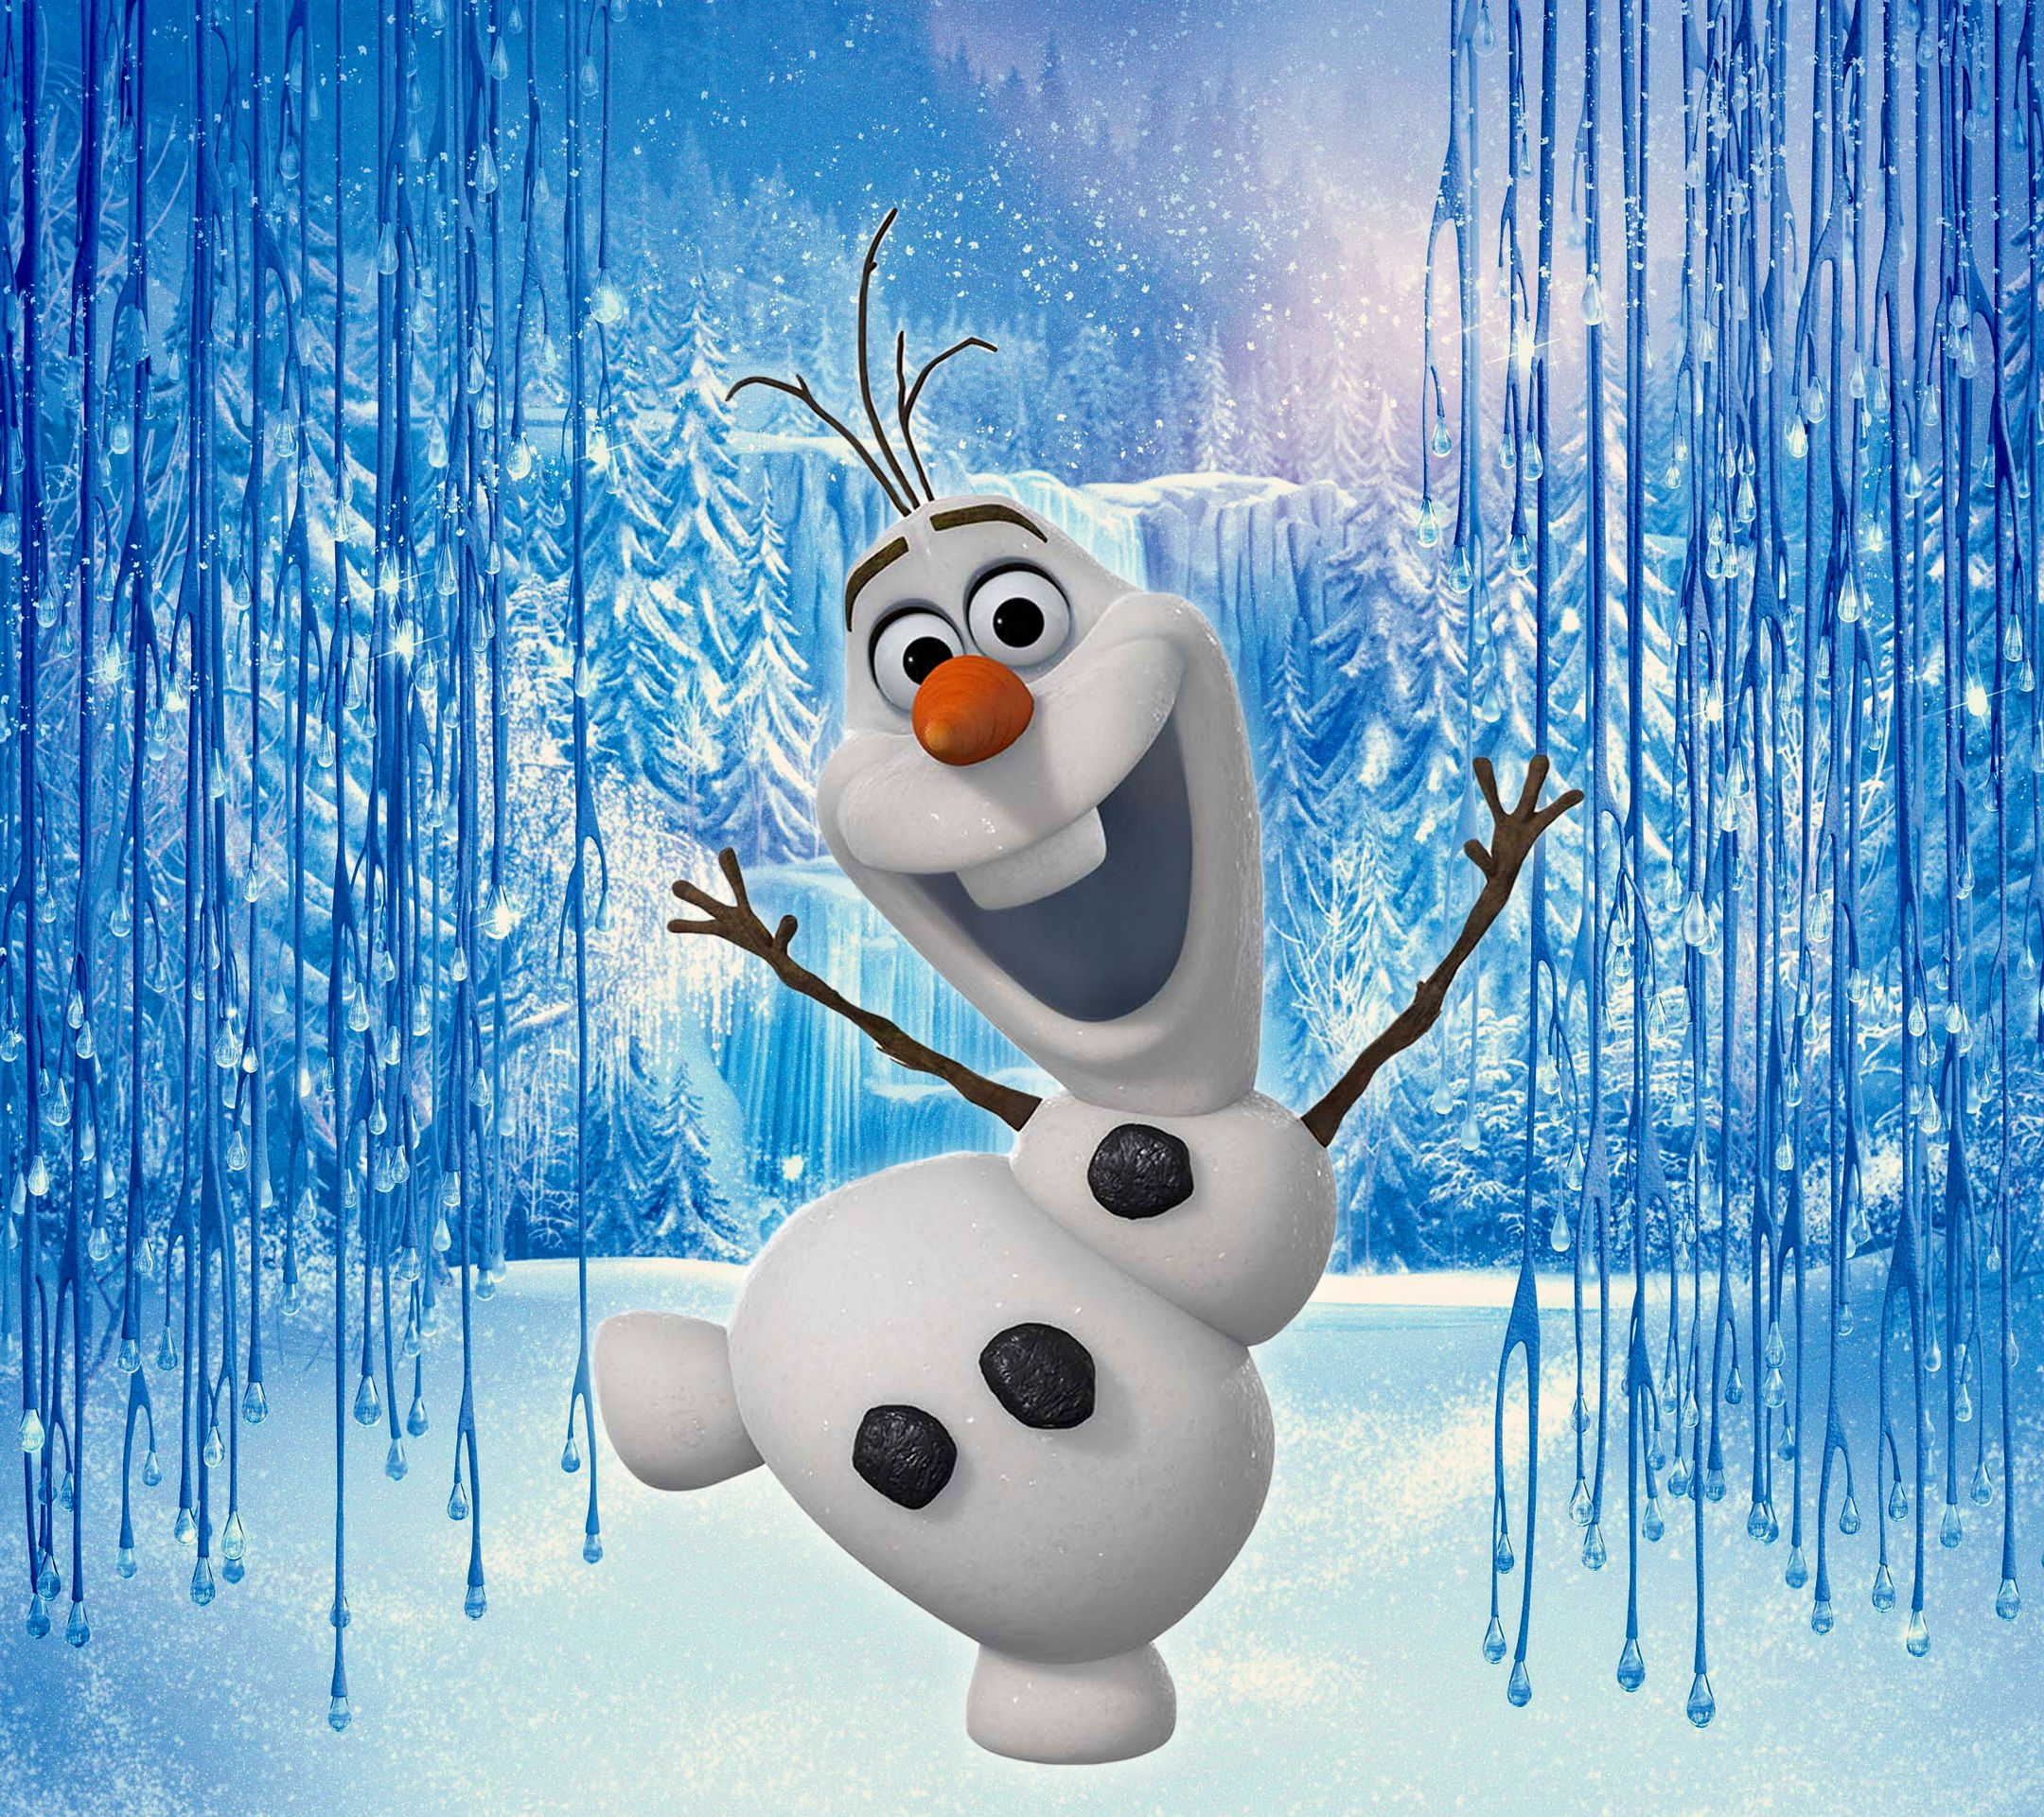 Olaf Wallpaper Olaf Frozen Wallpaper Papel De Parede Para